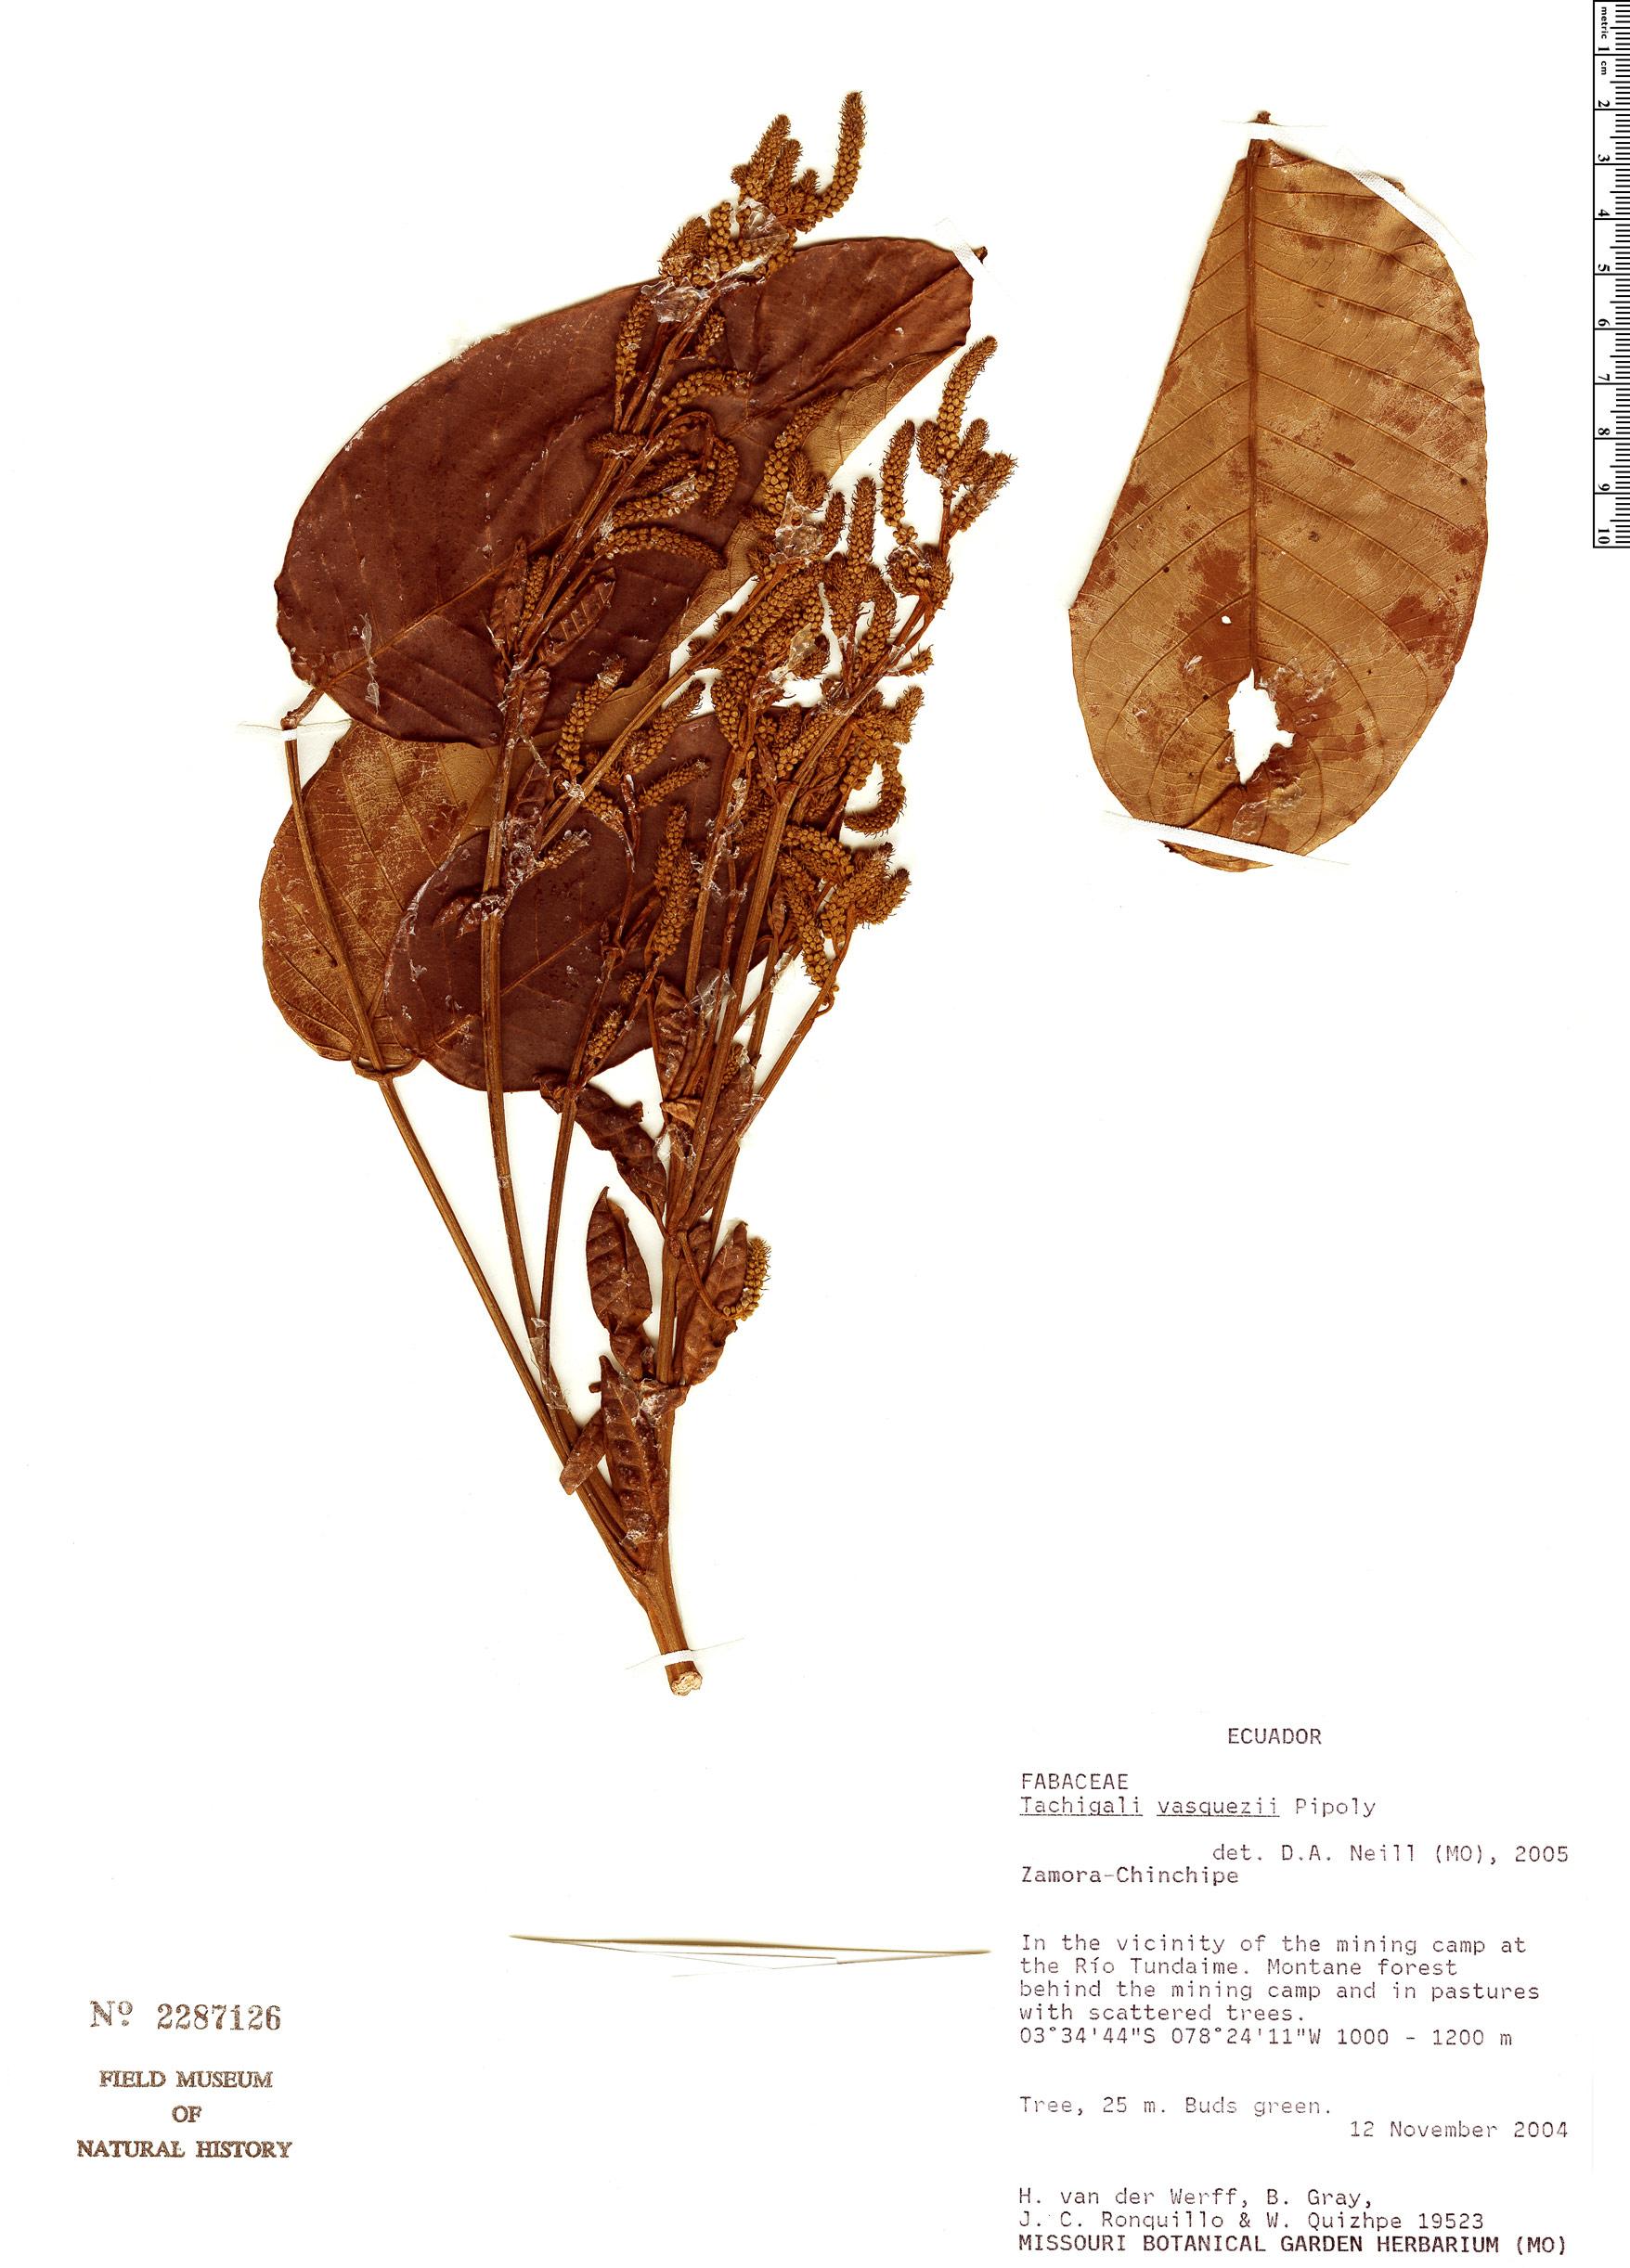 Specimen: Tachigali chrysaloides